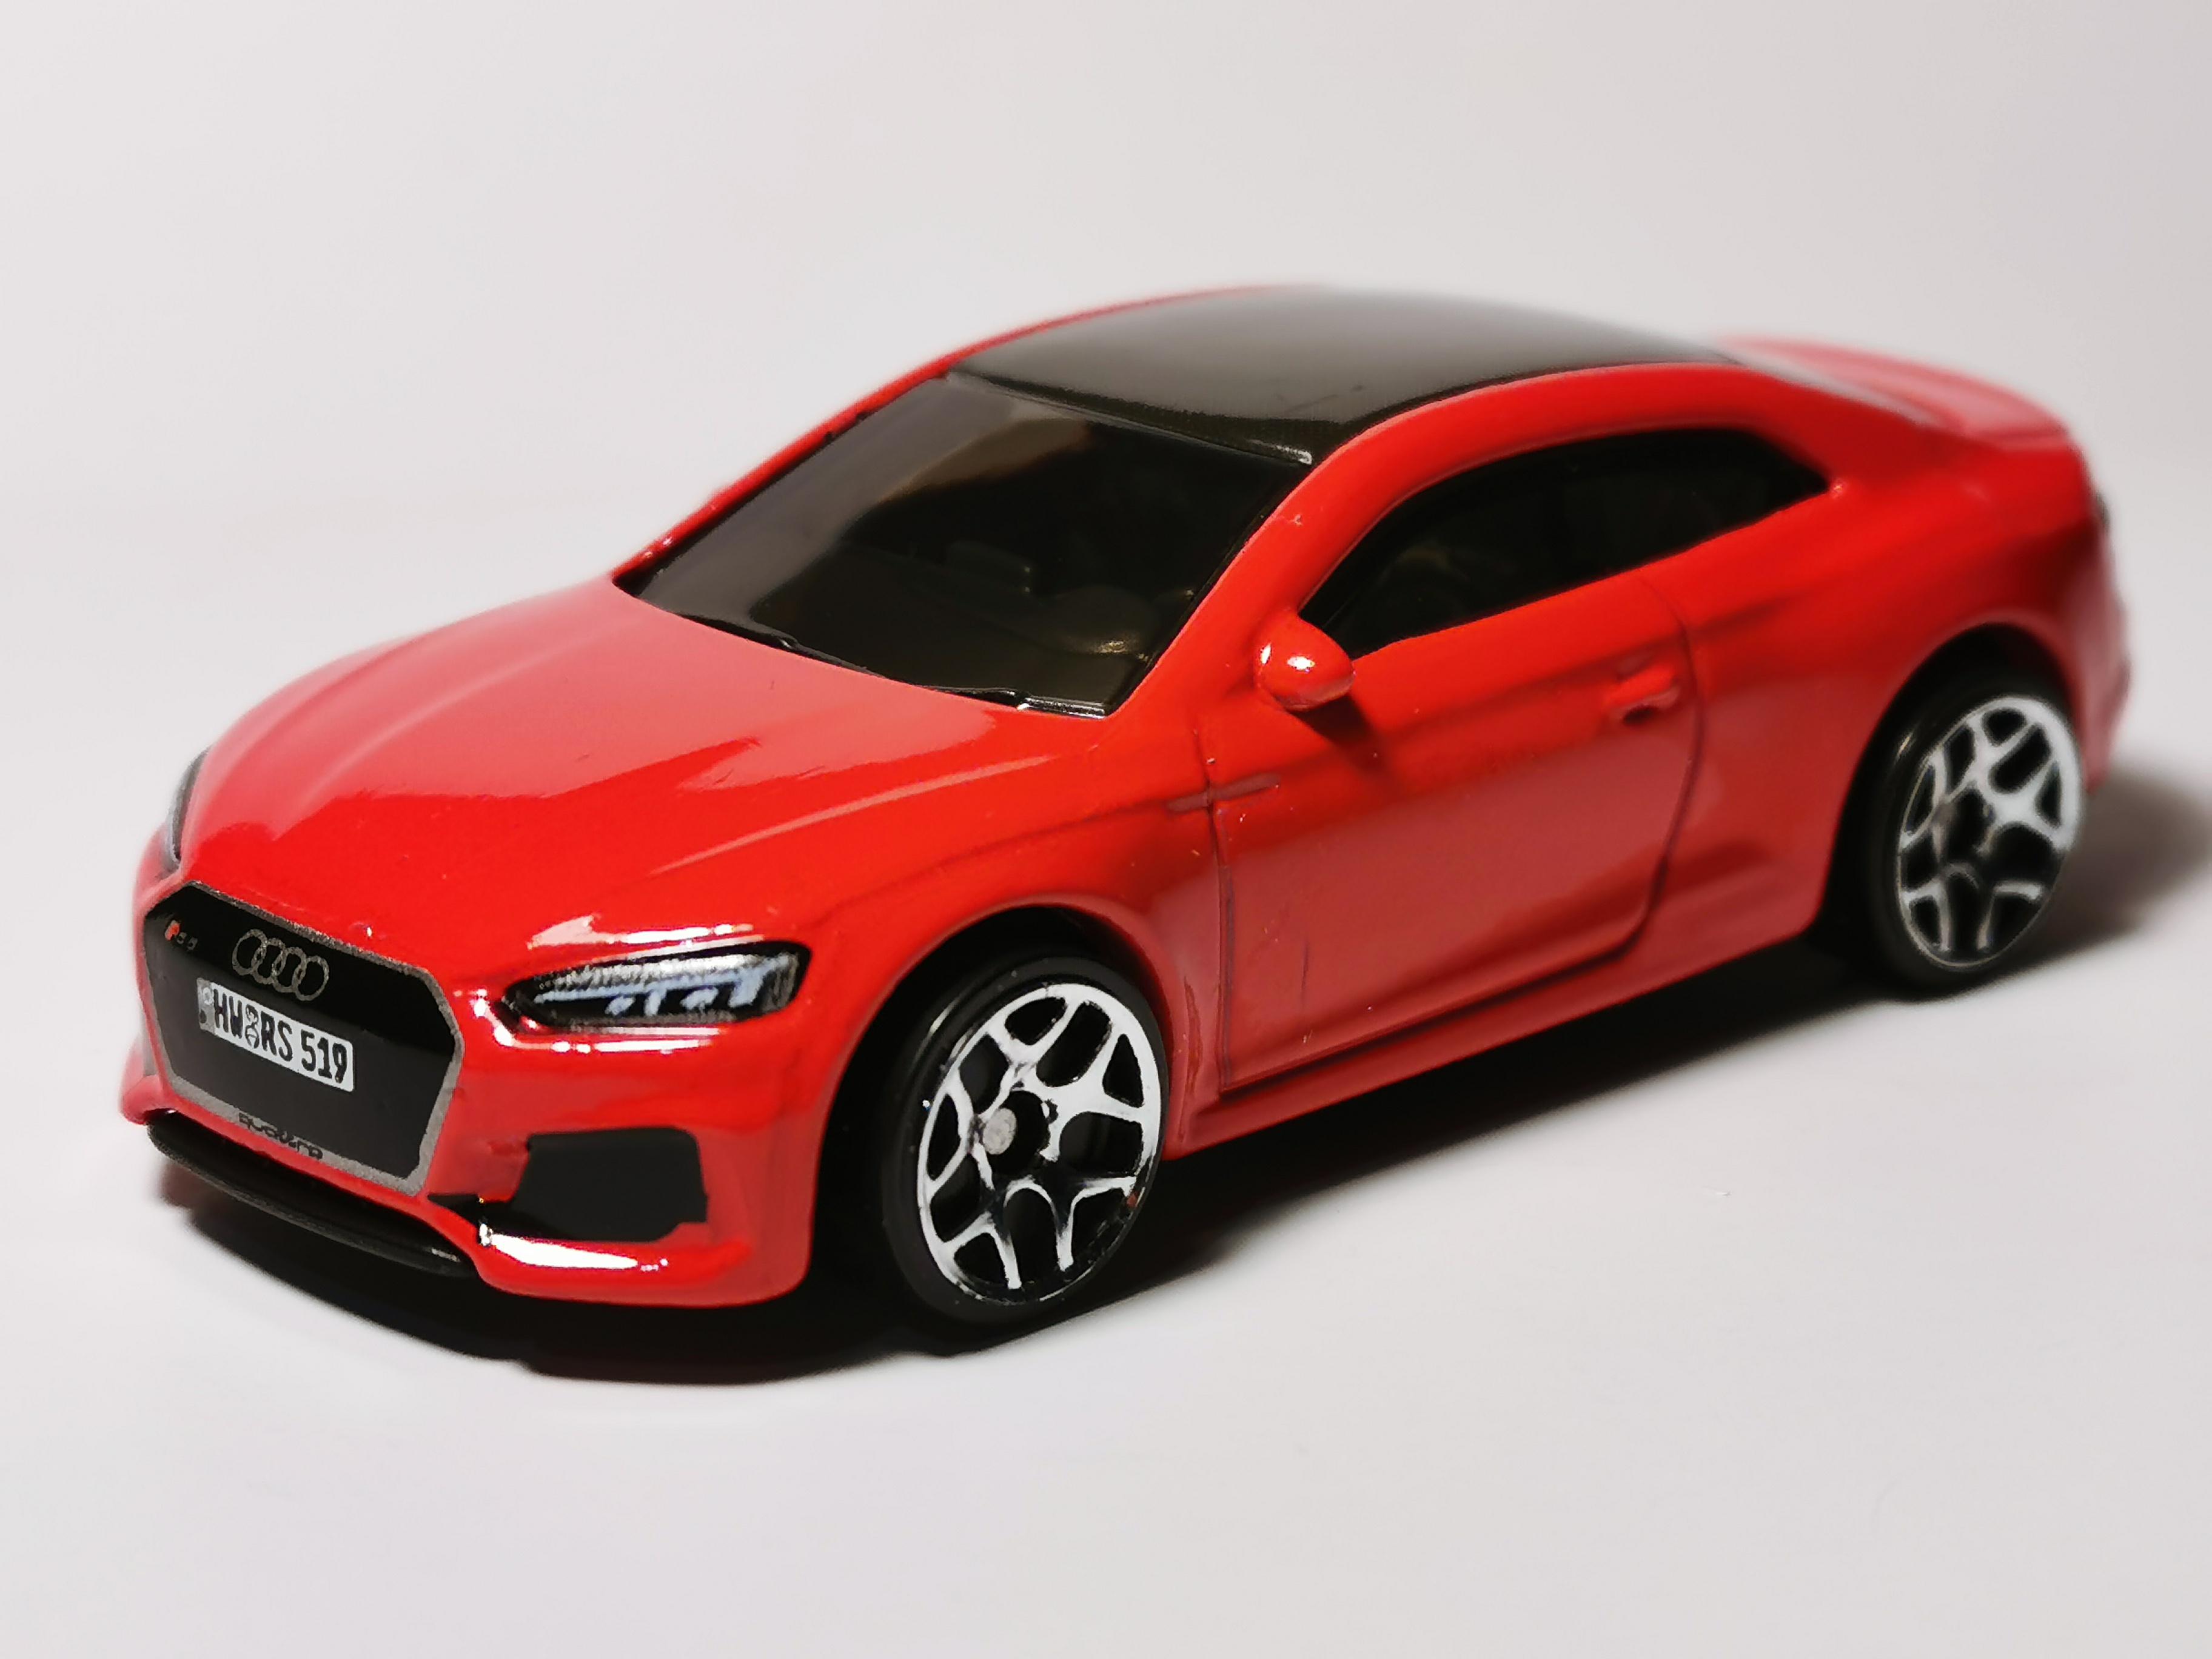 Audi Rs 5 Coupe Hot Wheels Wiki Fandom